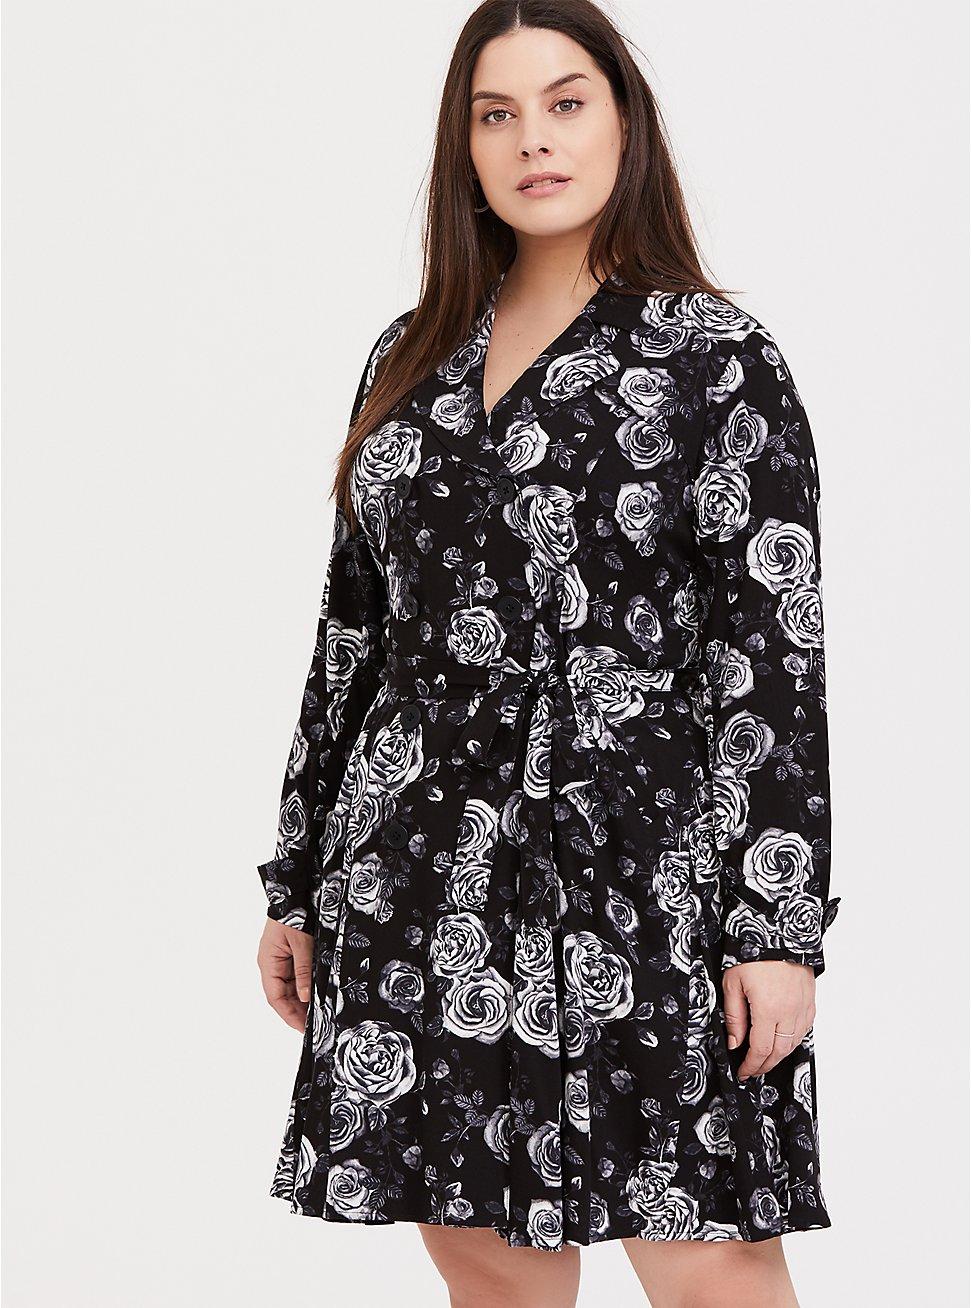 Black Floral Twill Fit & Flare Trench Coat, Old Hollywood Floral Black, hi-res